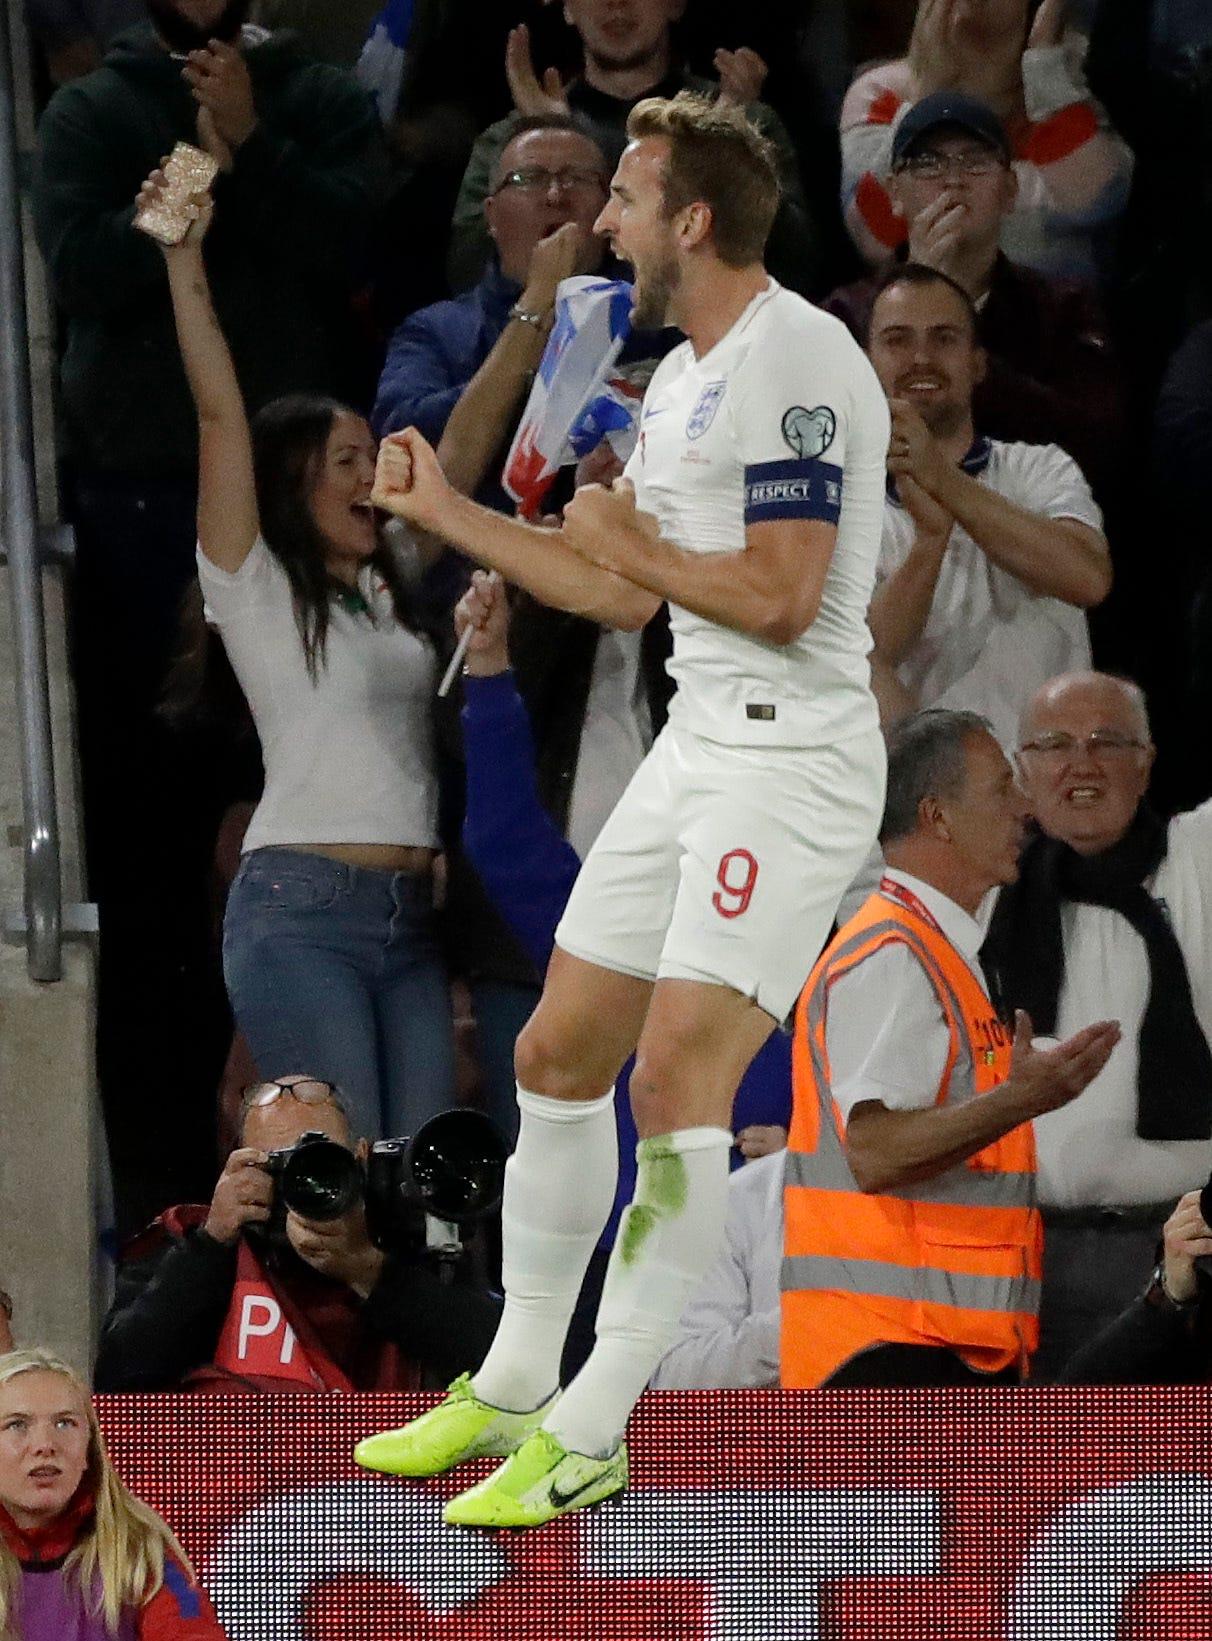 England beats Kosovo 5-3 in wild Euro 2020 qualifier